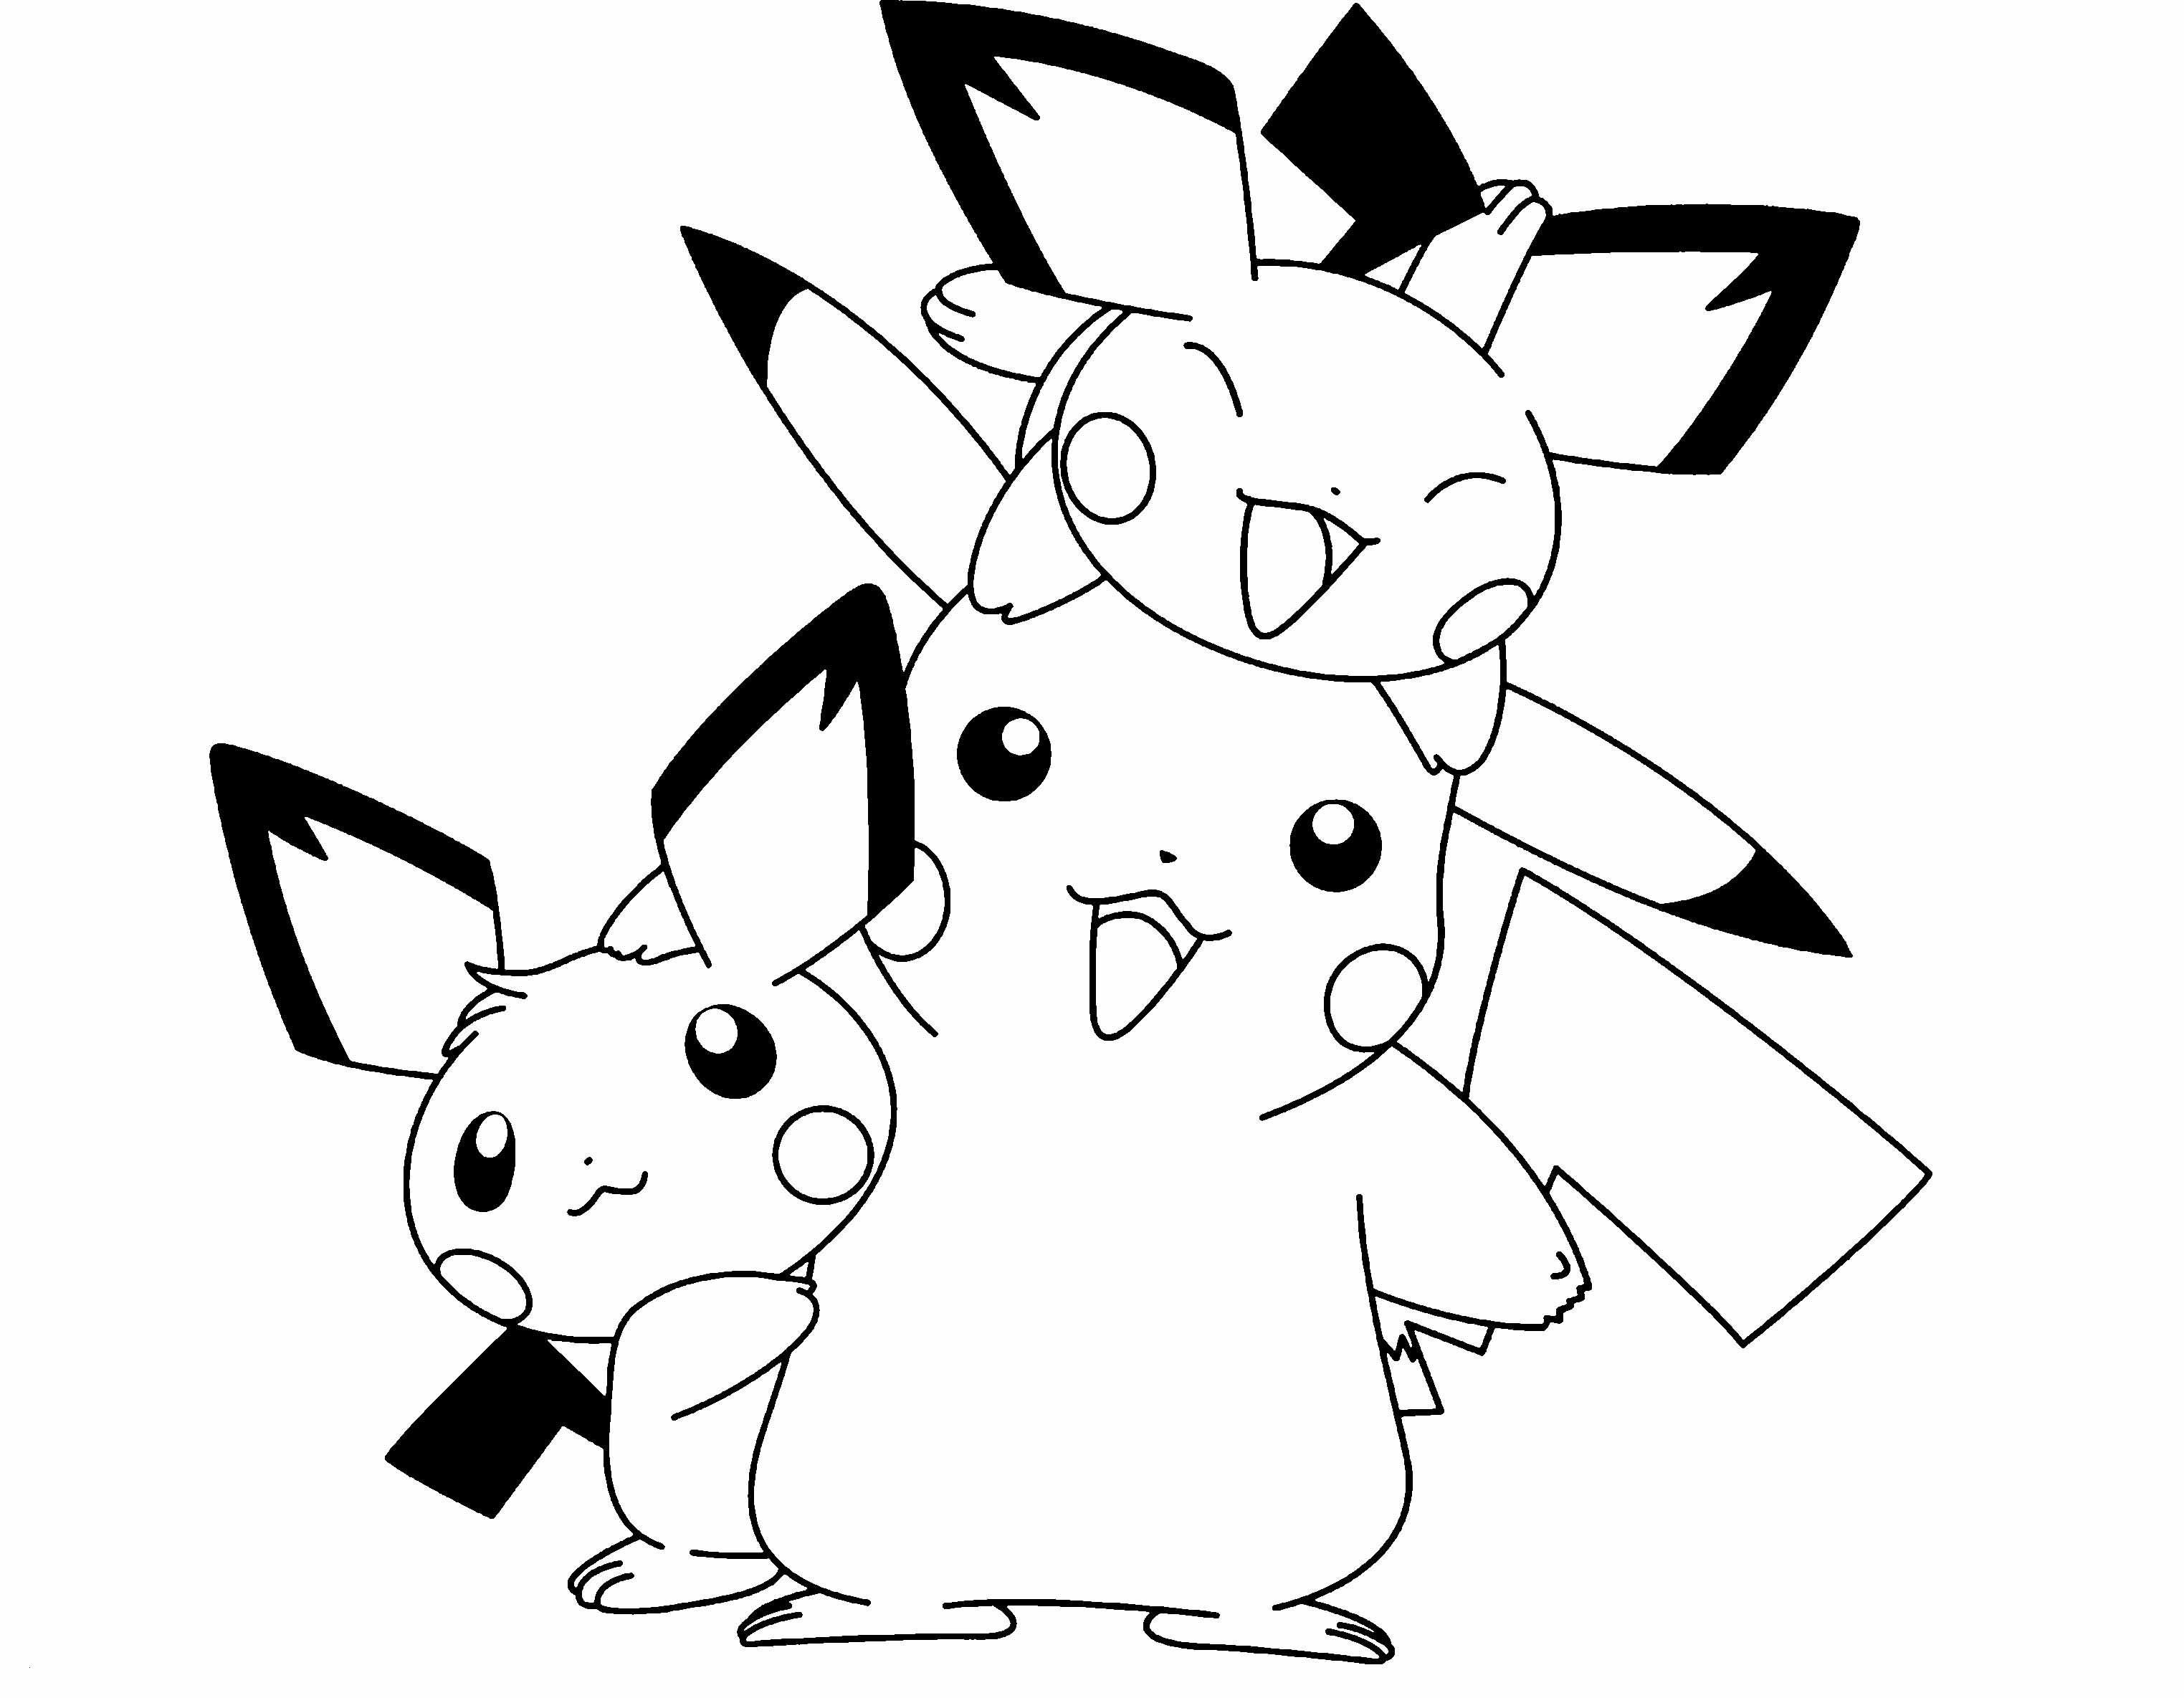 Ausmalbilder Pokemon Neu 24 Pikachu Coloring Pages Gallery Coloring Sheets Bilder